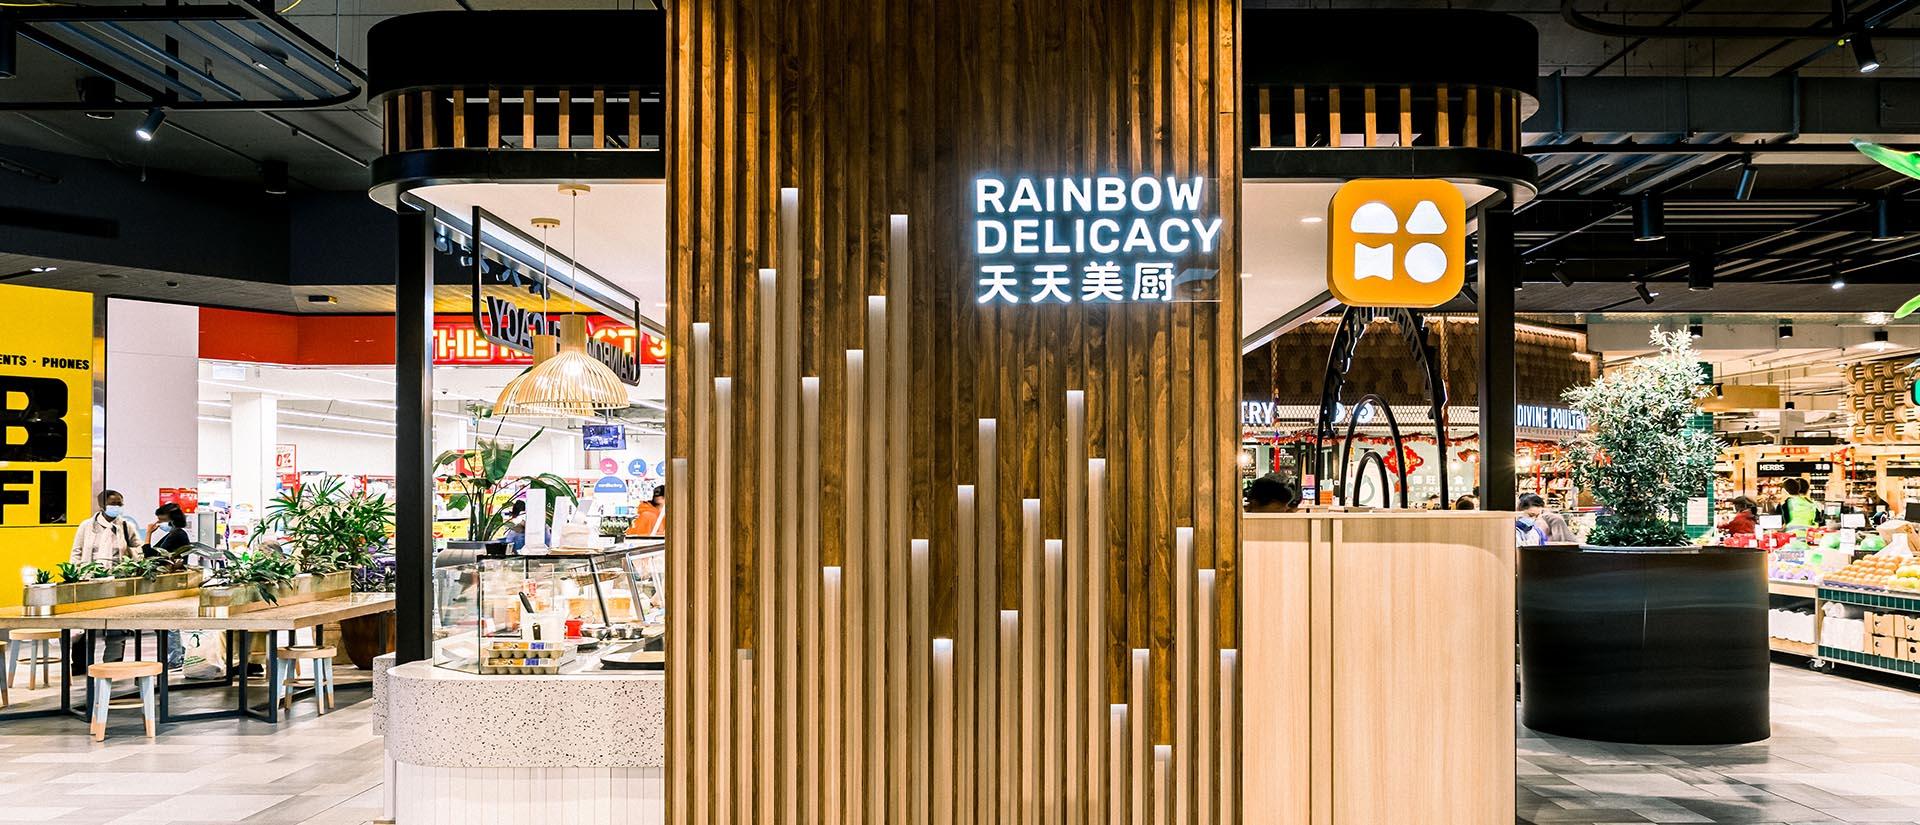 Projects-Kiosk- Rainbow Delicacy 2